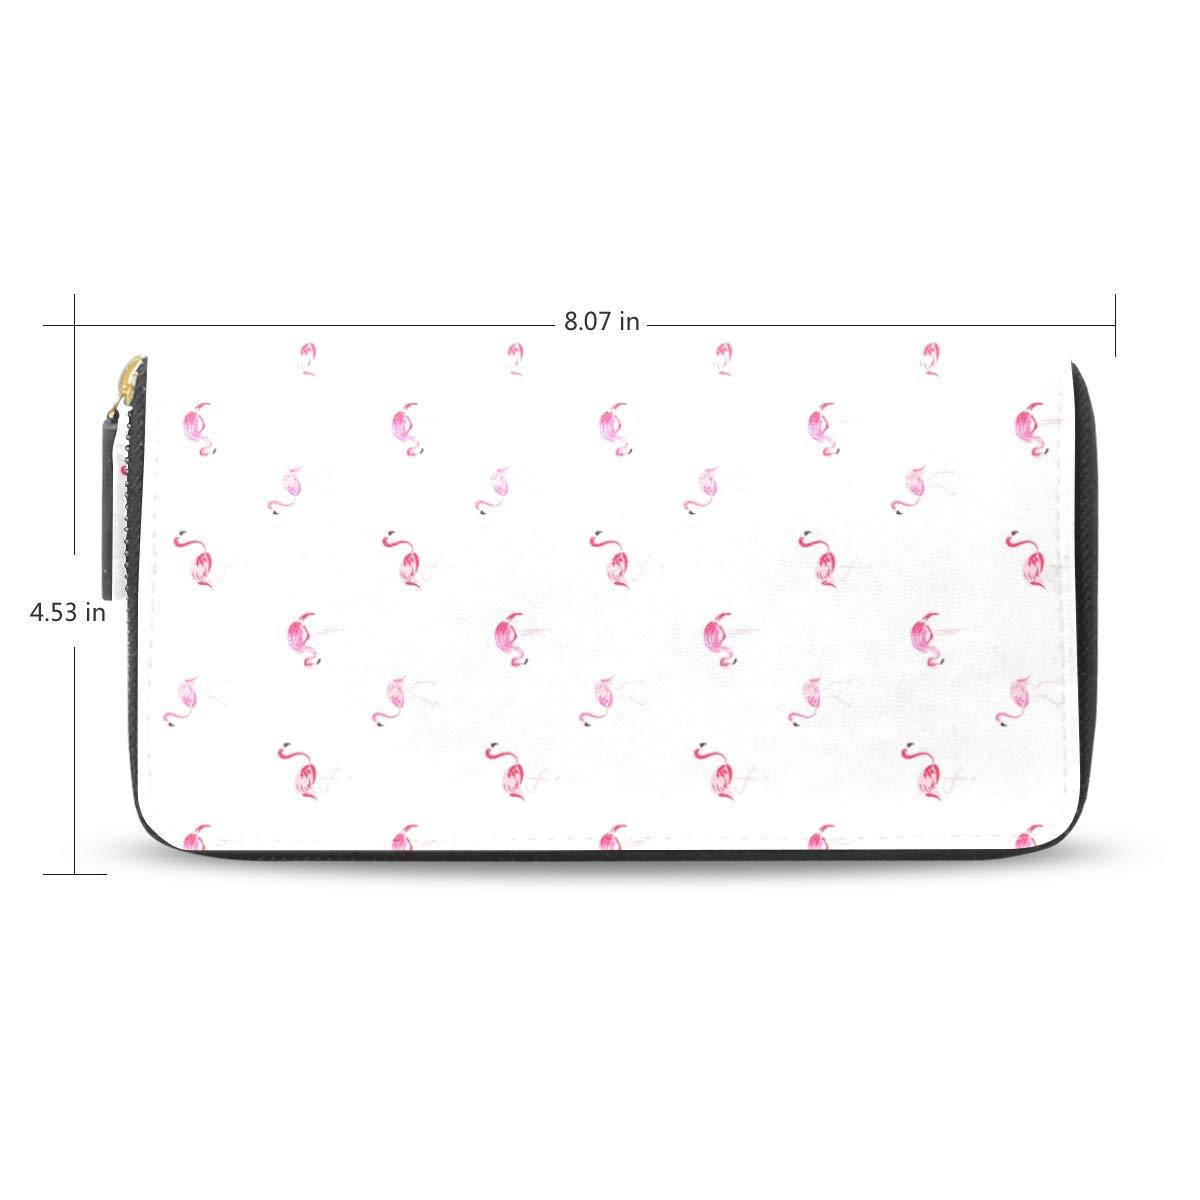 Women LeatherFlamingo Cartoon Pink Wallet Large Capacity Zipper Travel Wristlet Bags Clutch Cellphone Bag